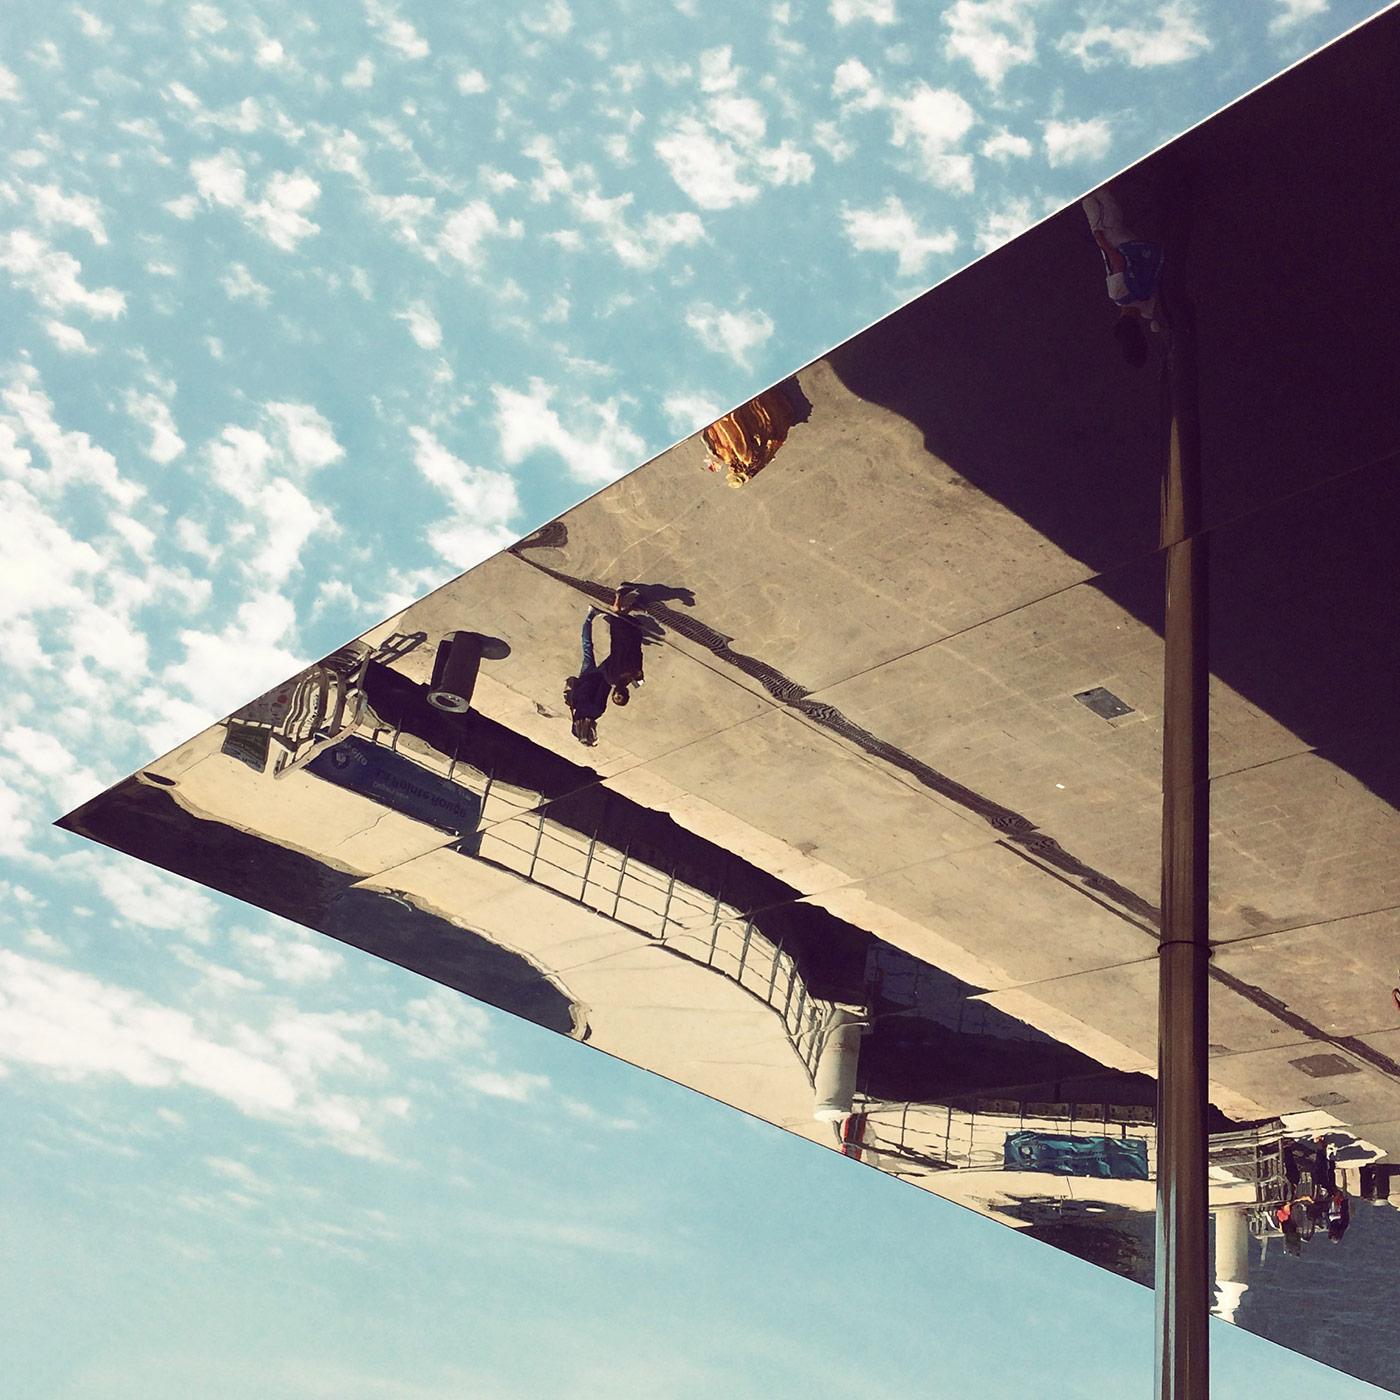 Vieux Port Pavilion <br />Location: Marseille, France <br />Architects: Foster + Partners